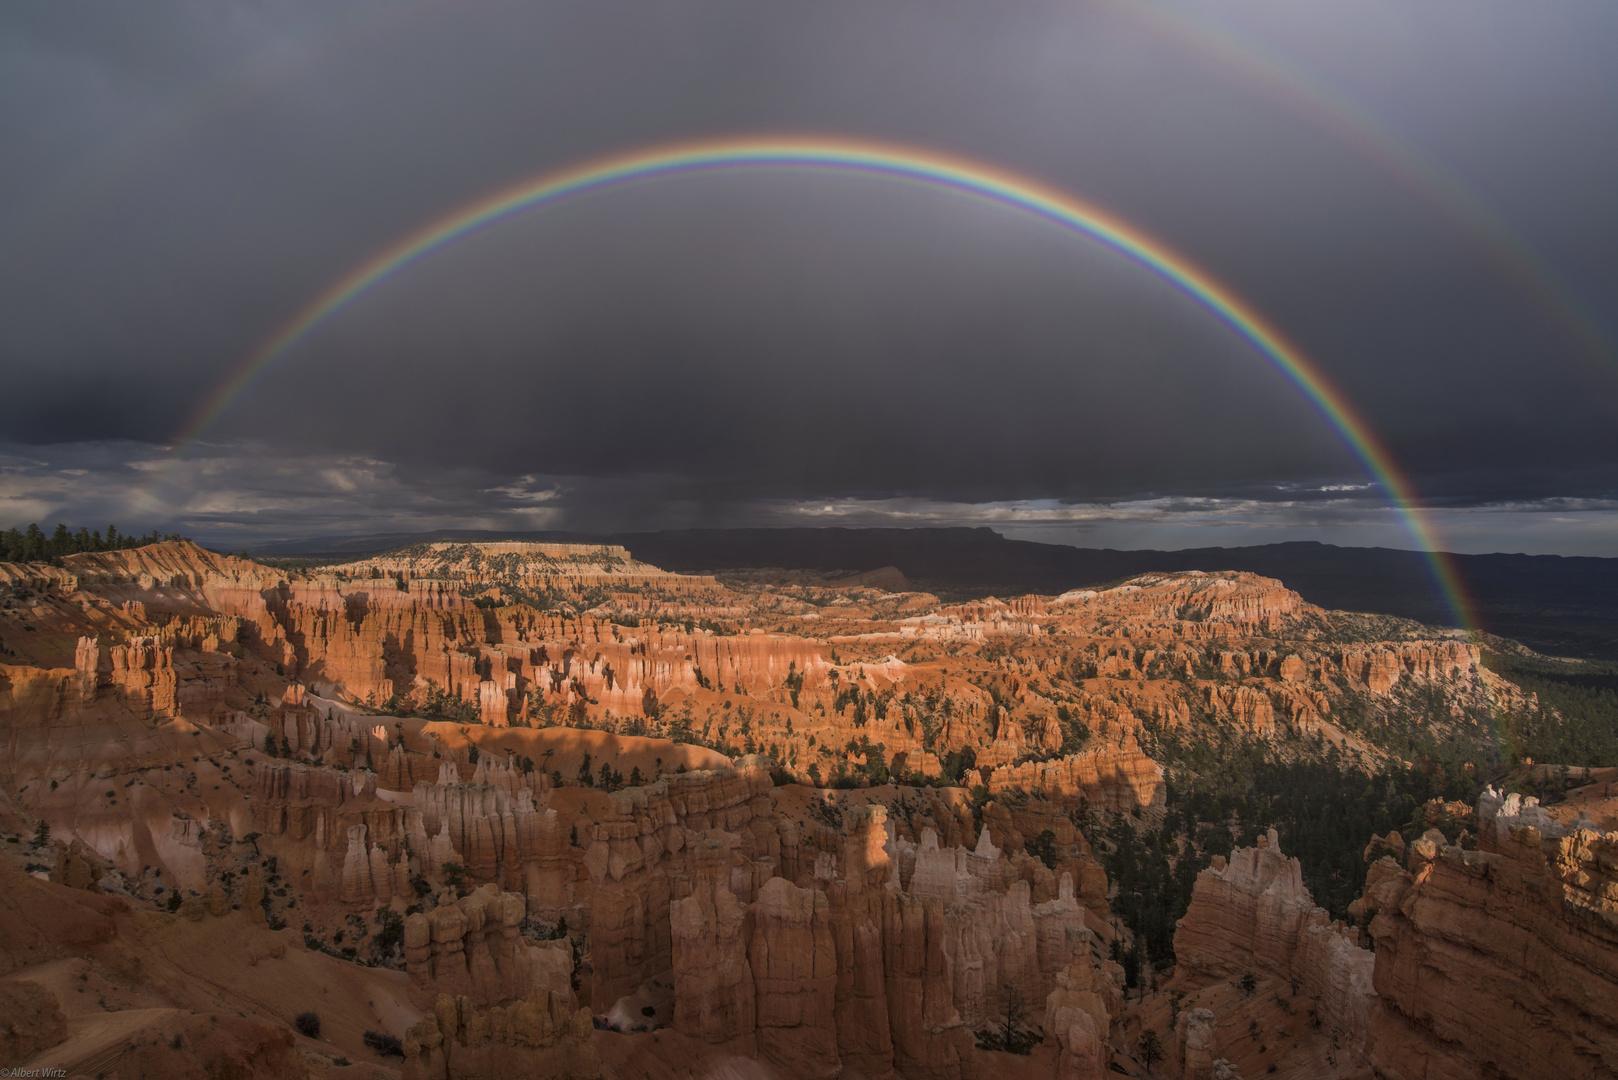 *Bryce Canyon unter dem Regenbogen*